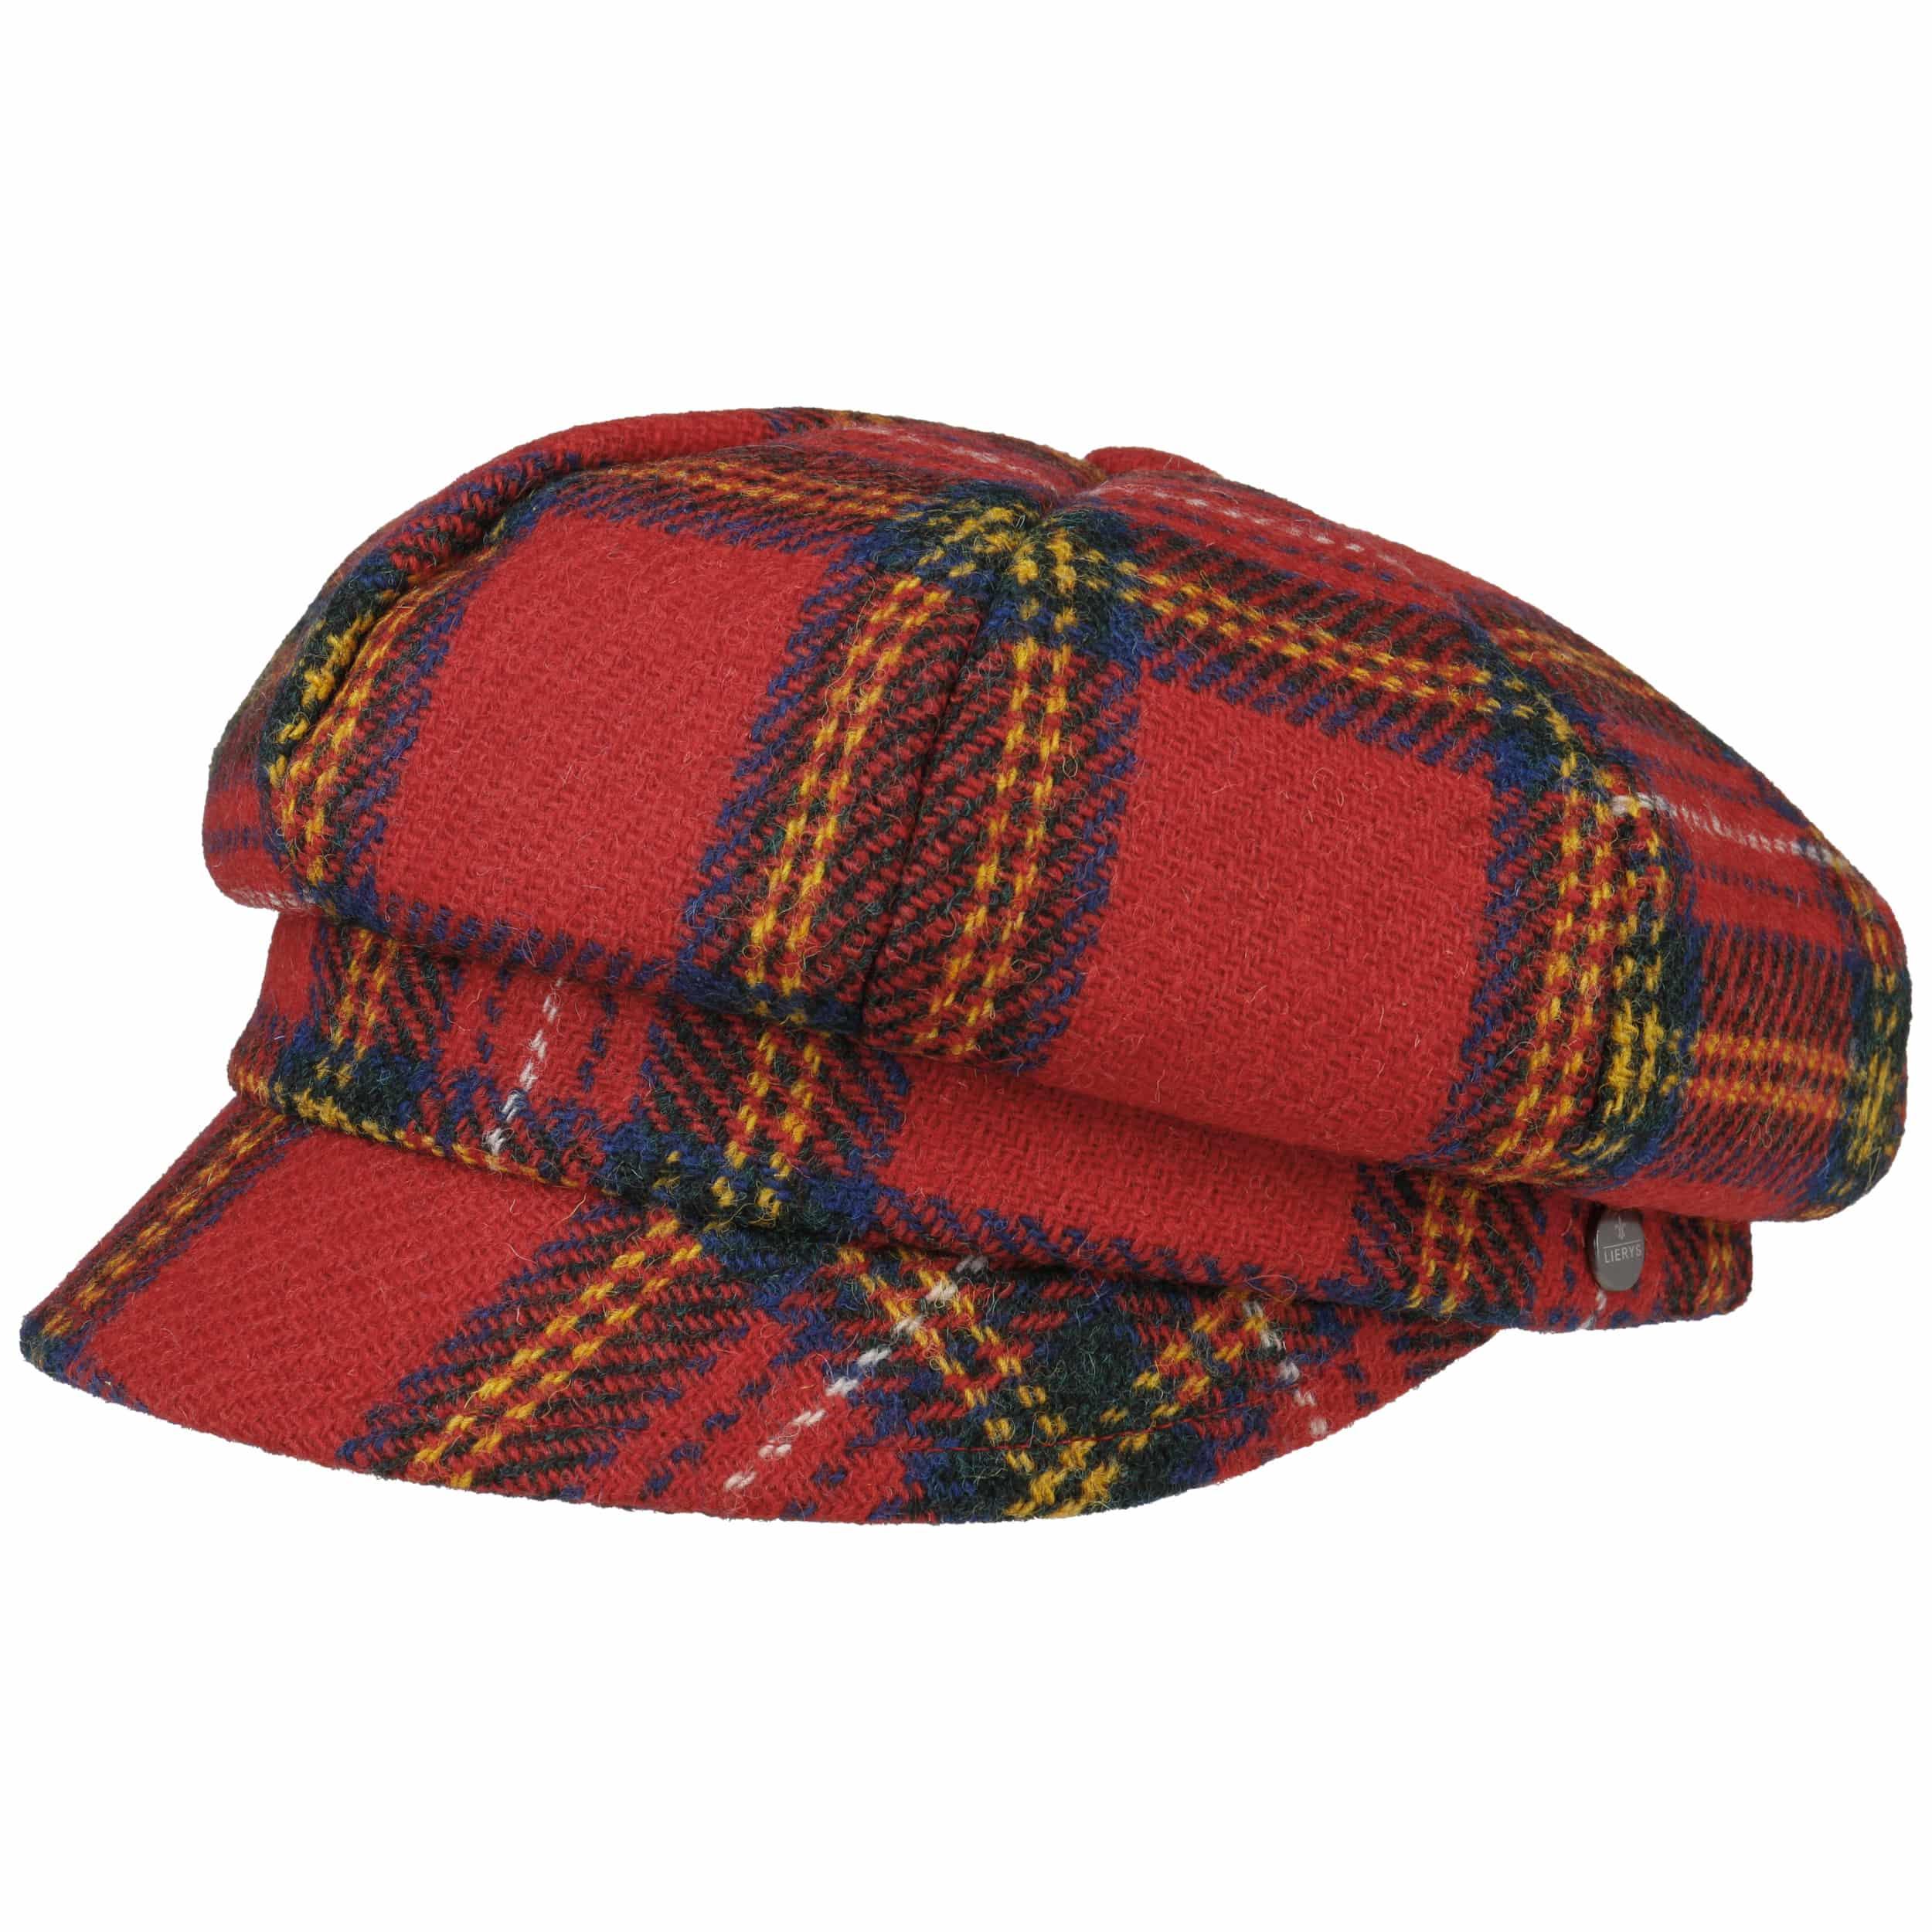 12d902f5616 Harris tweed plaid newsboy cap lierys eur hats caps jpg 2500x2500 Plaid  newsboy cap